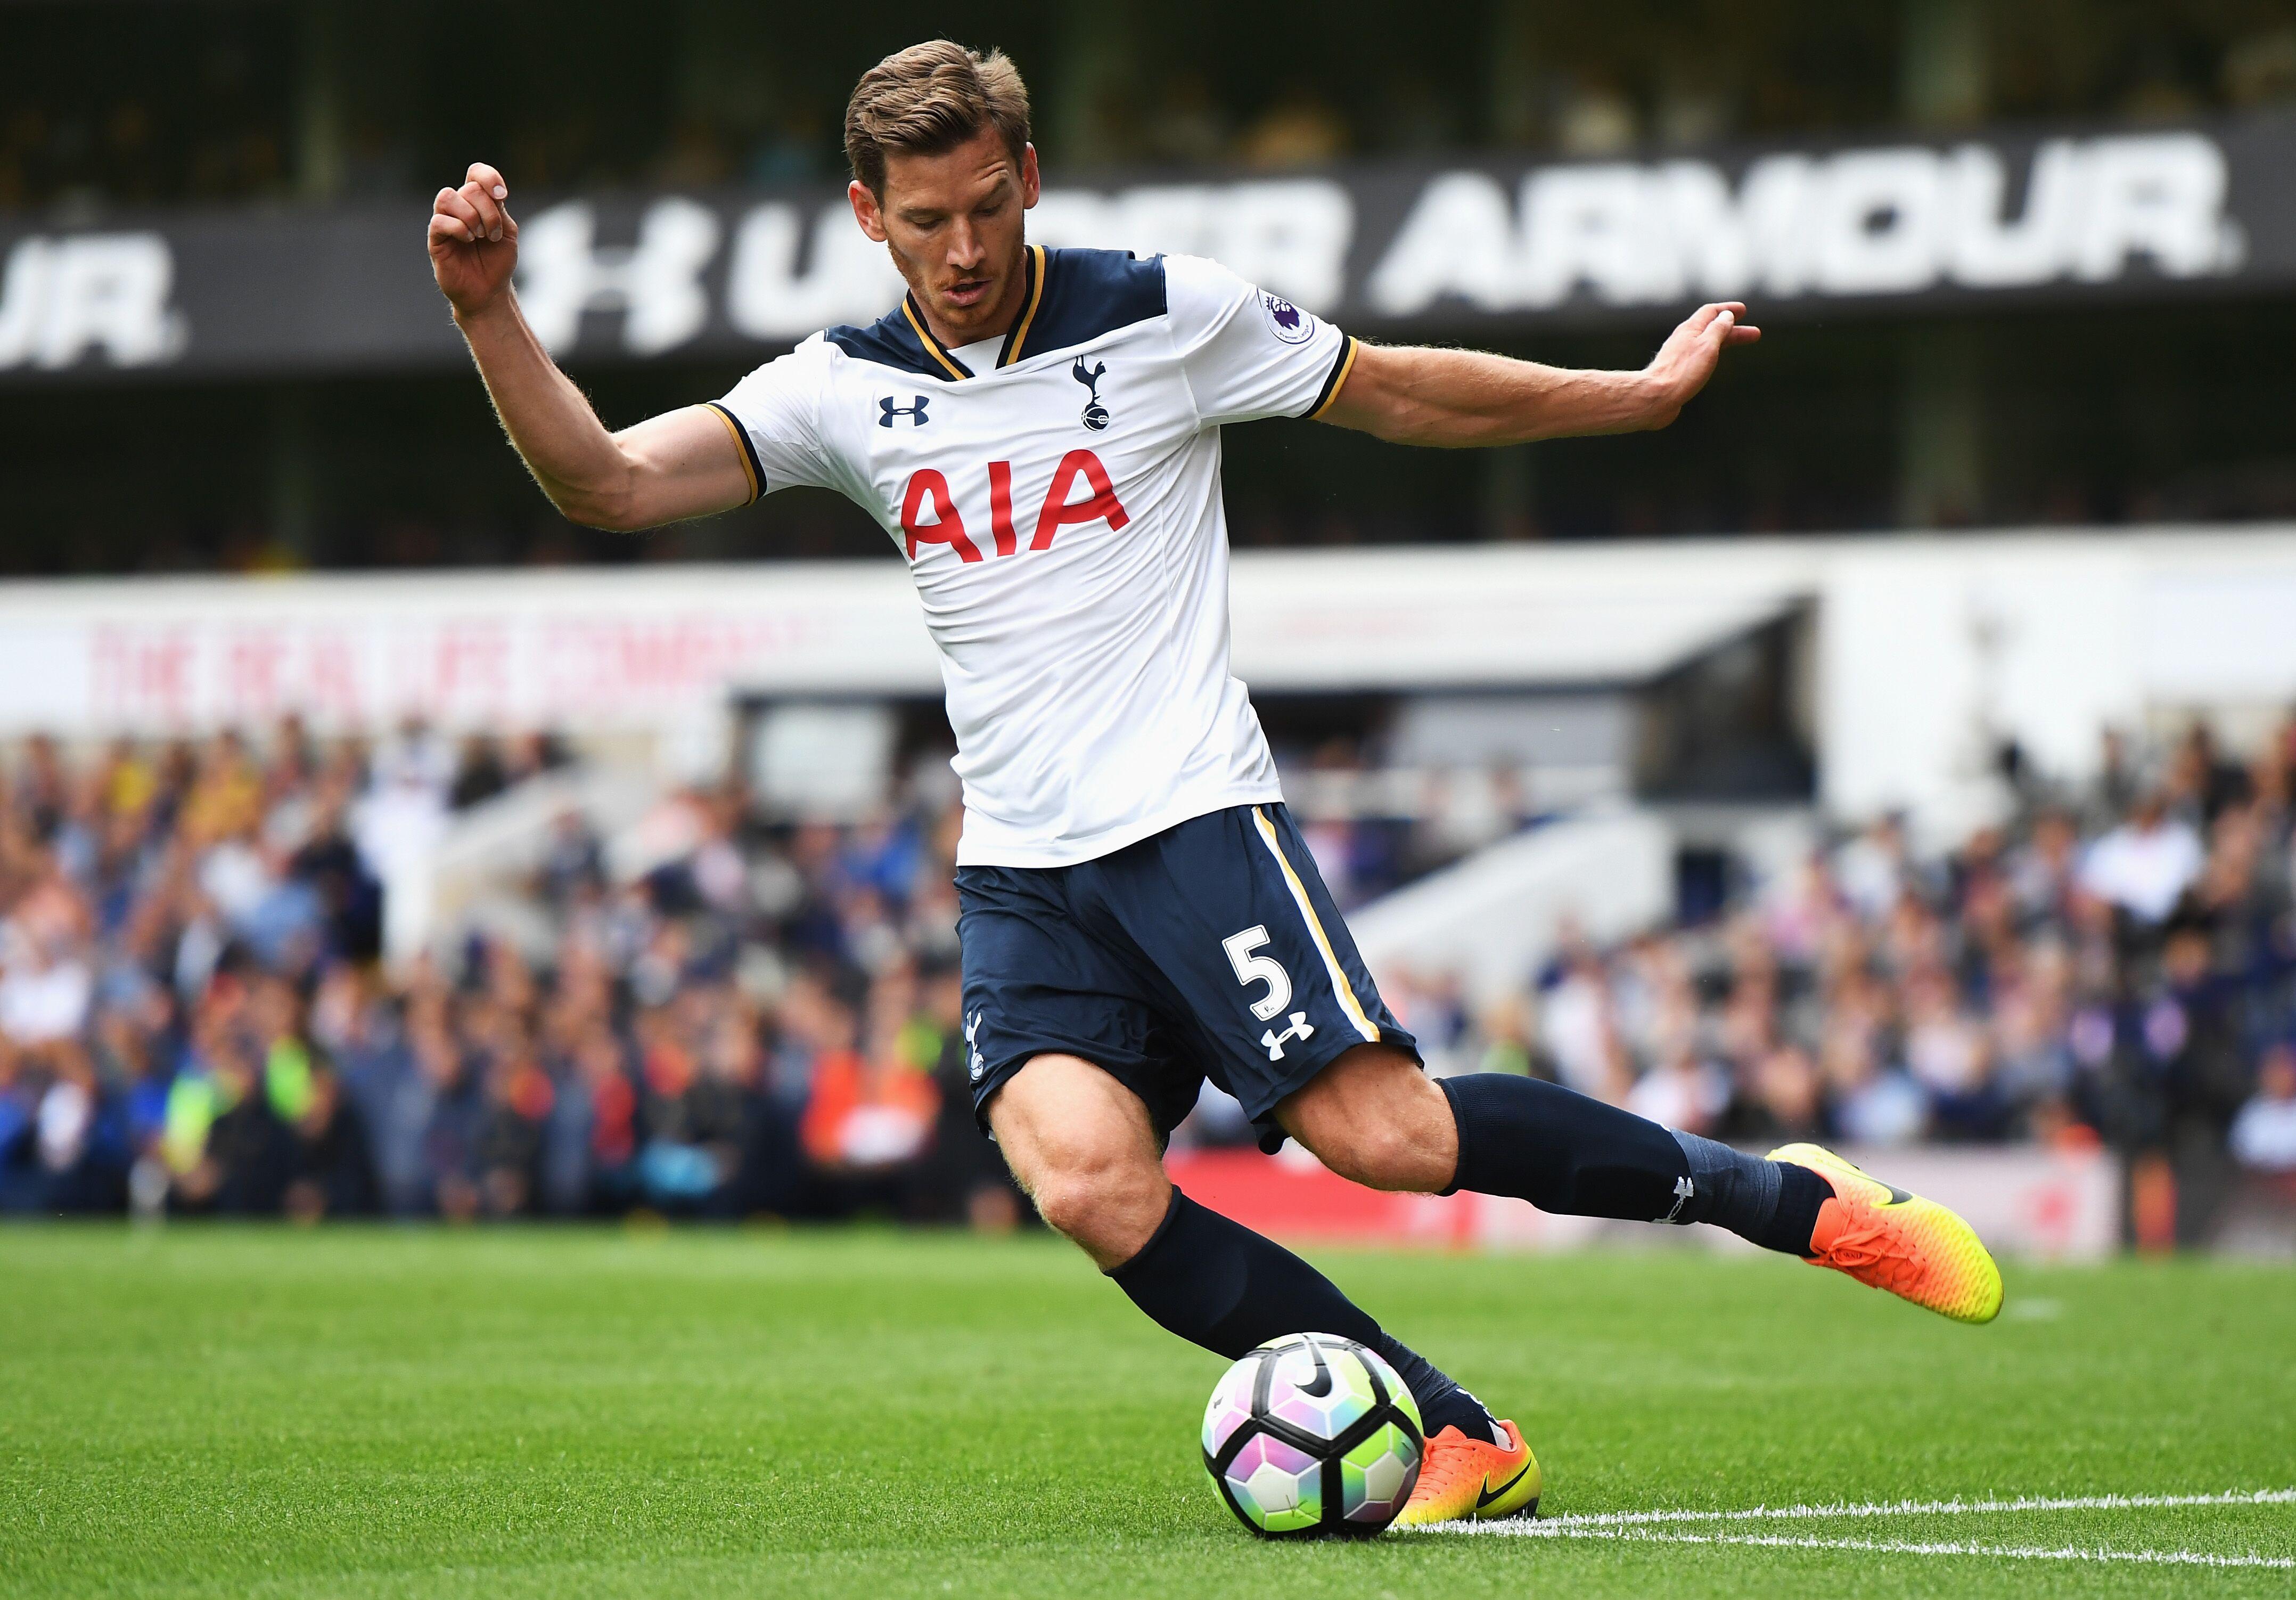 Tottenham must ease Jan Vertonghen out of the starting XI